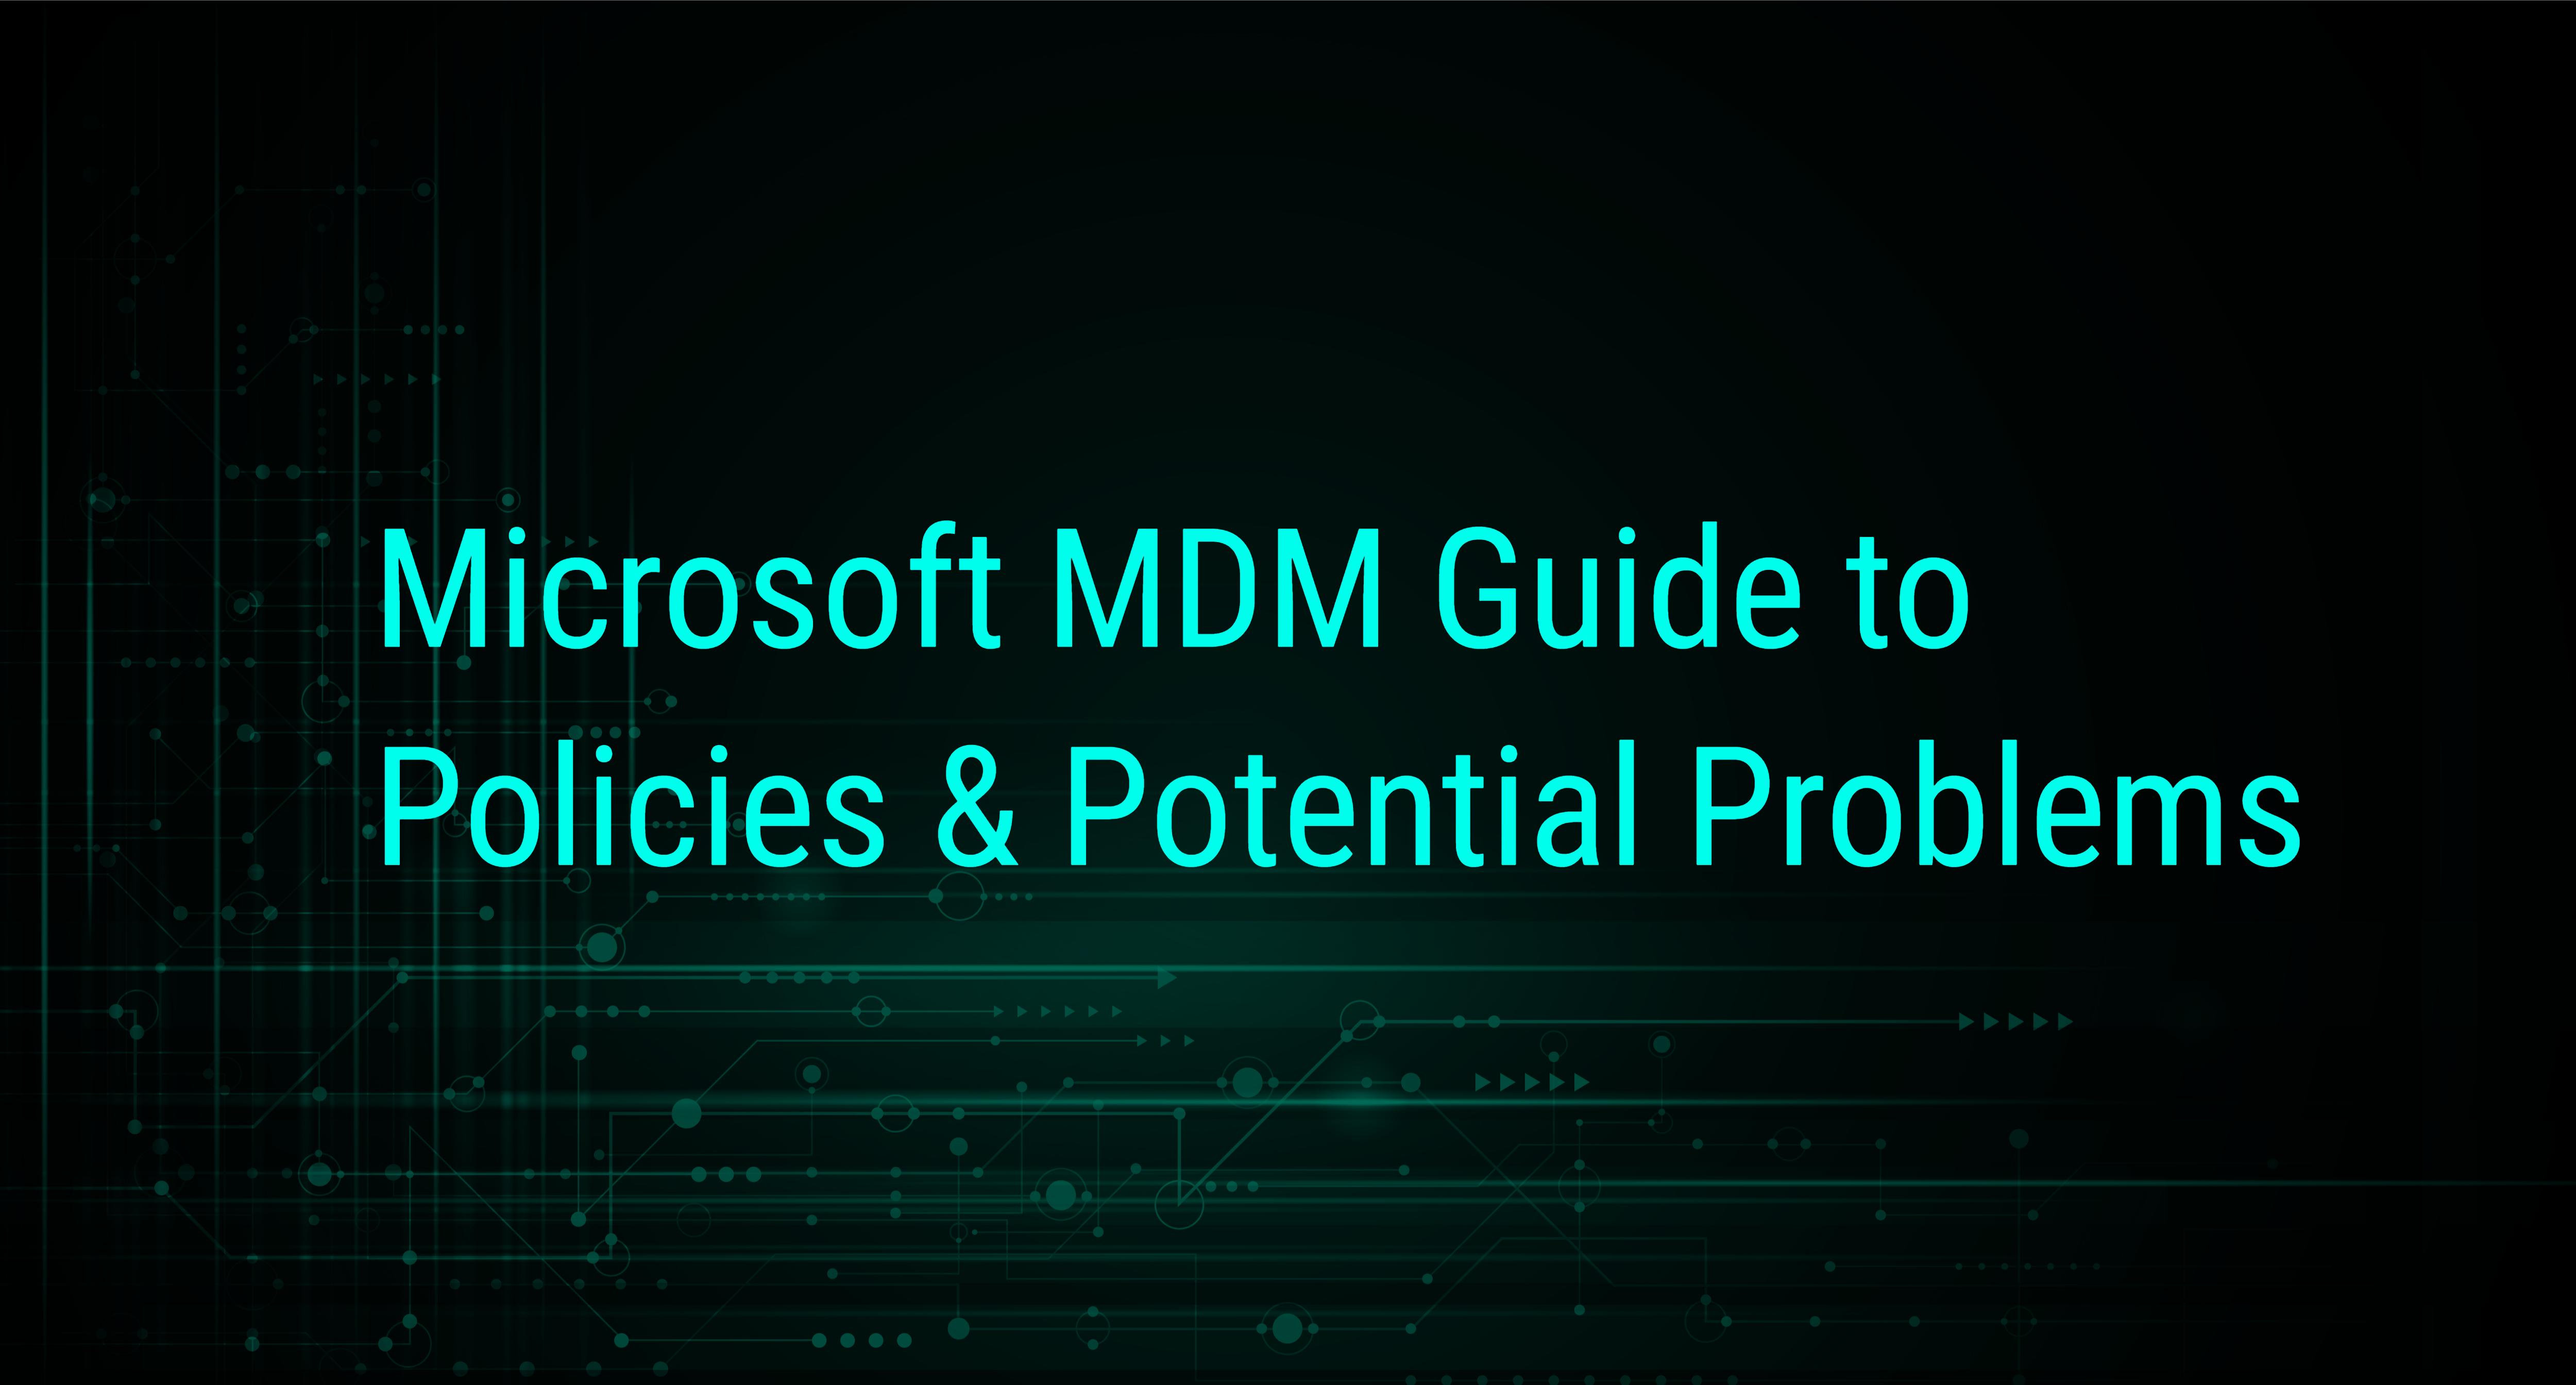 Microsoft MDM Hero